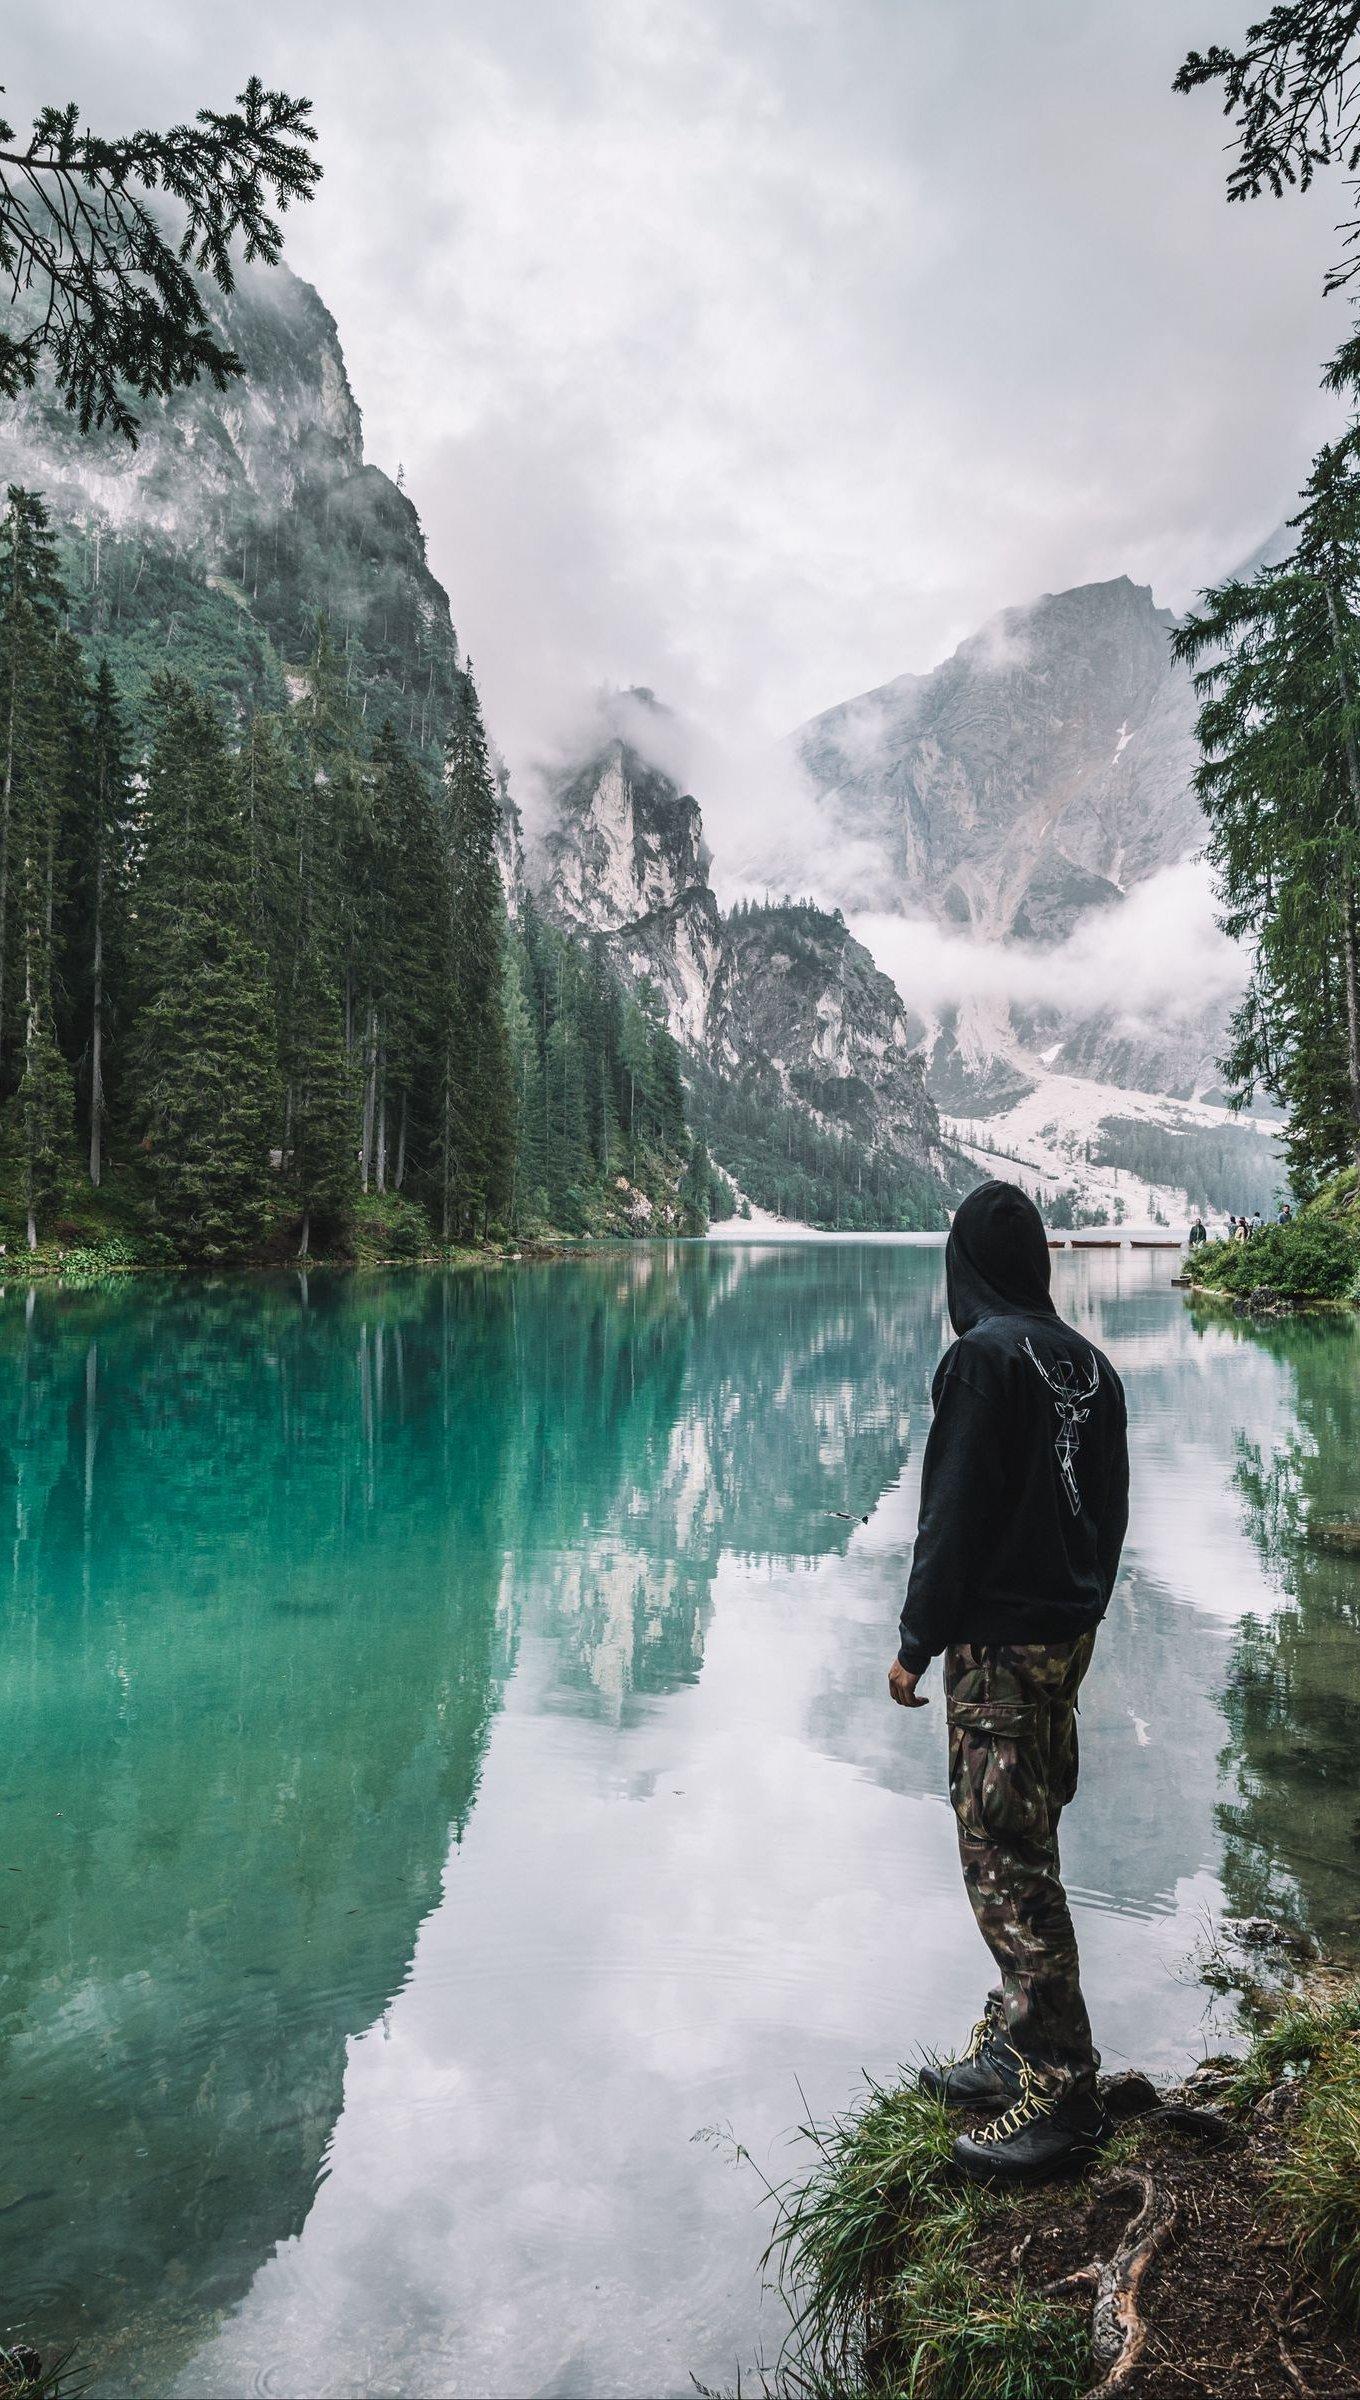 Fondos de pantalla Hombre frente a lago en el bosque Vertical